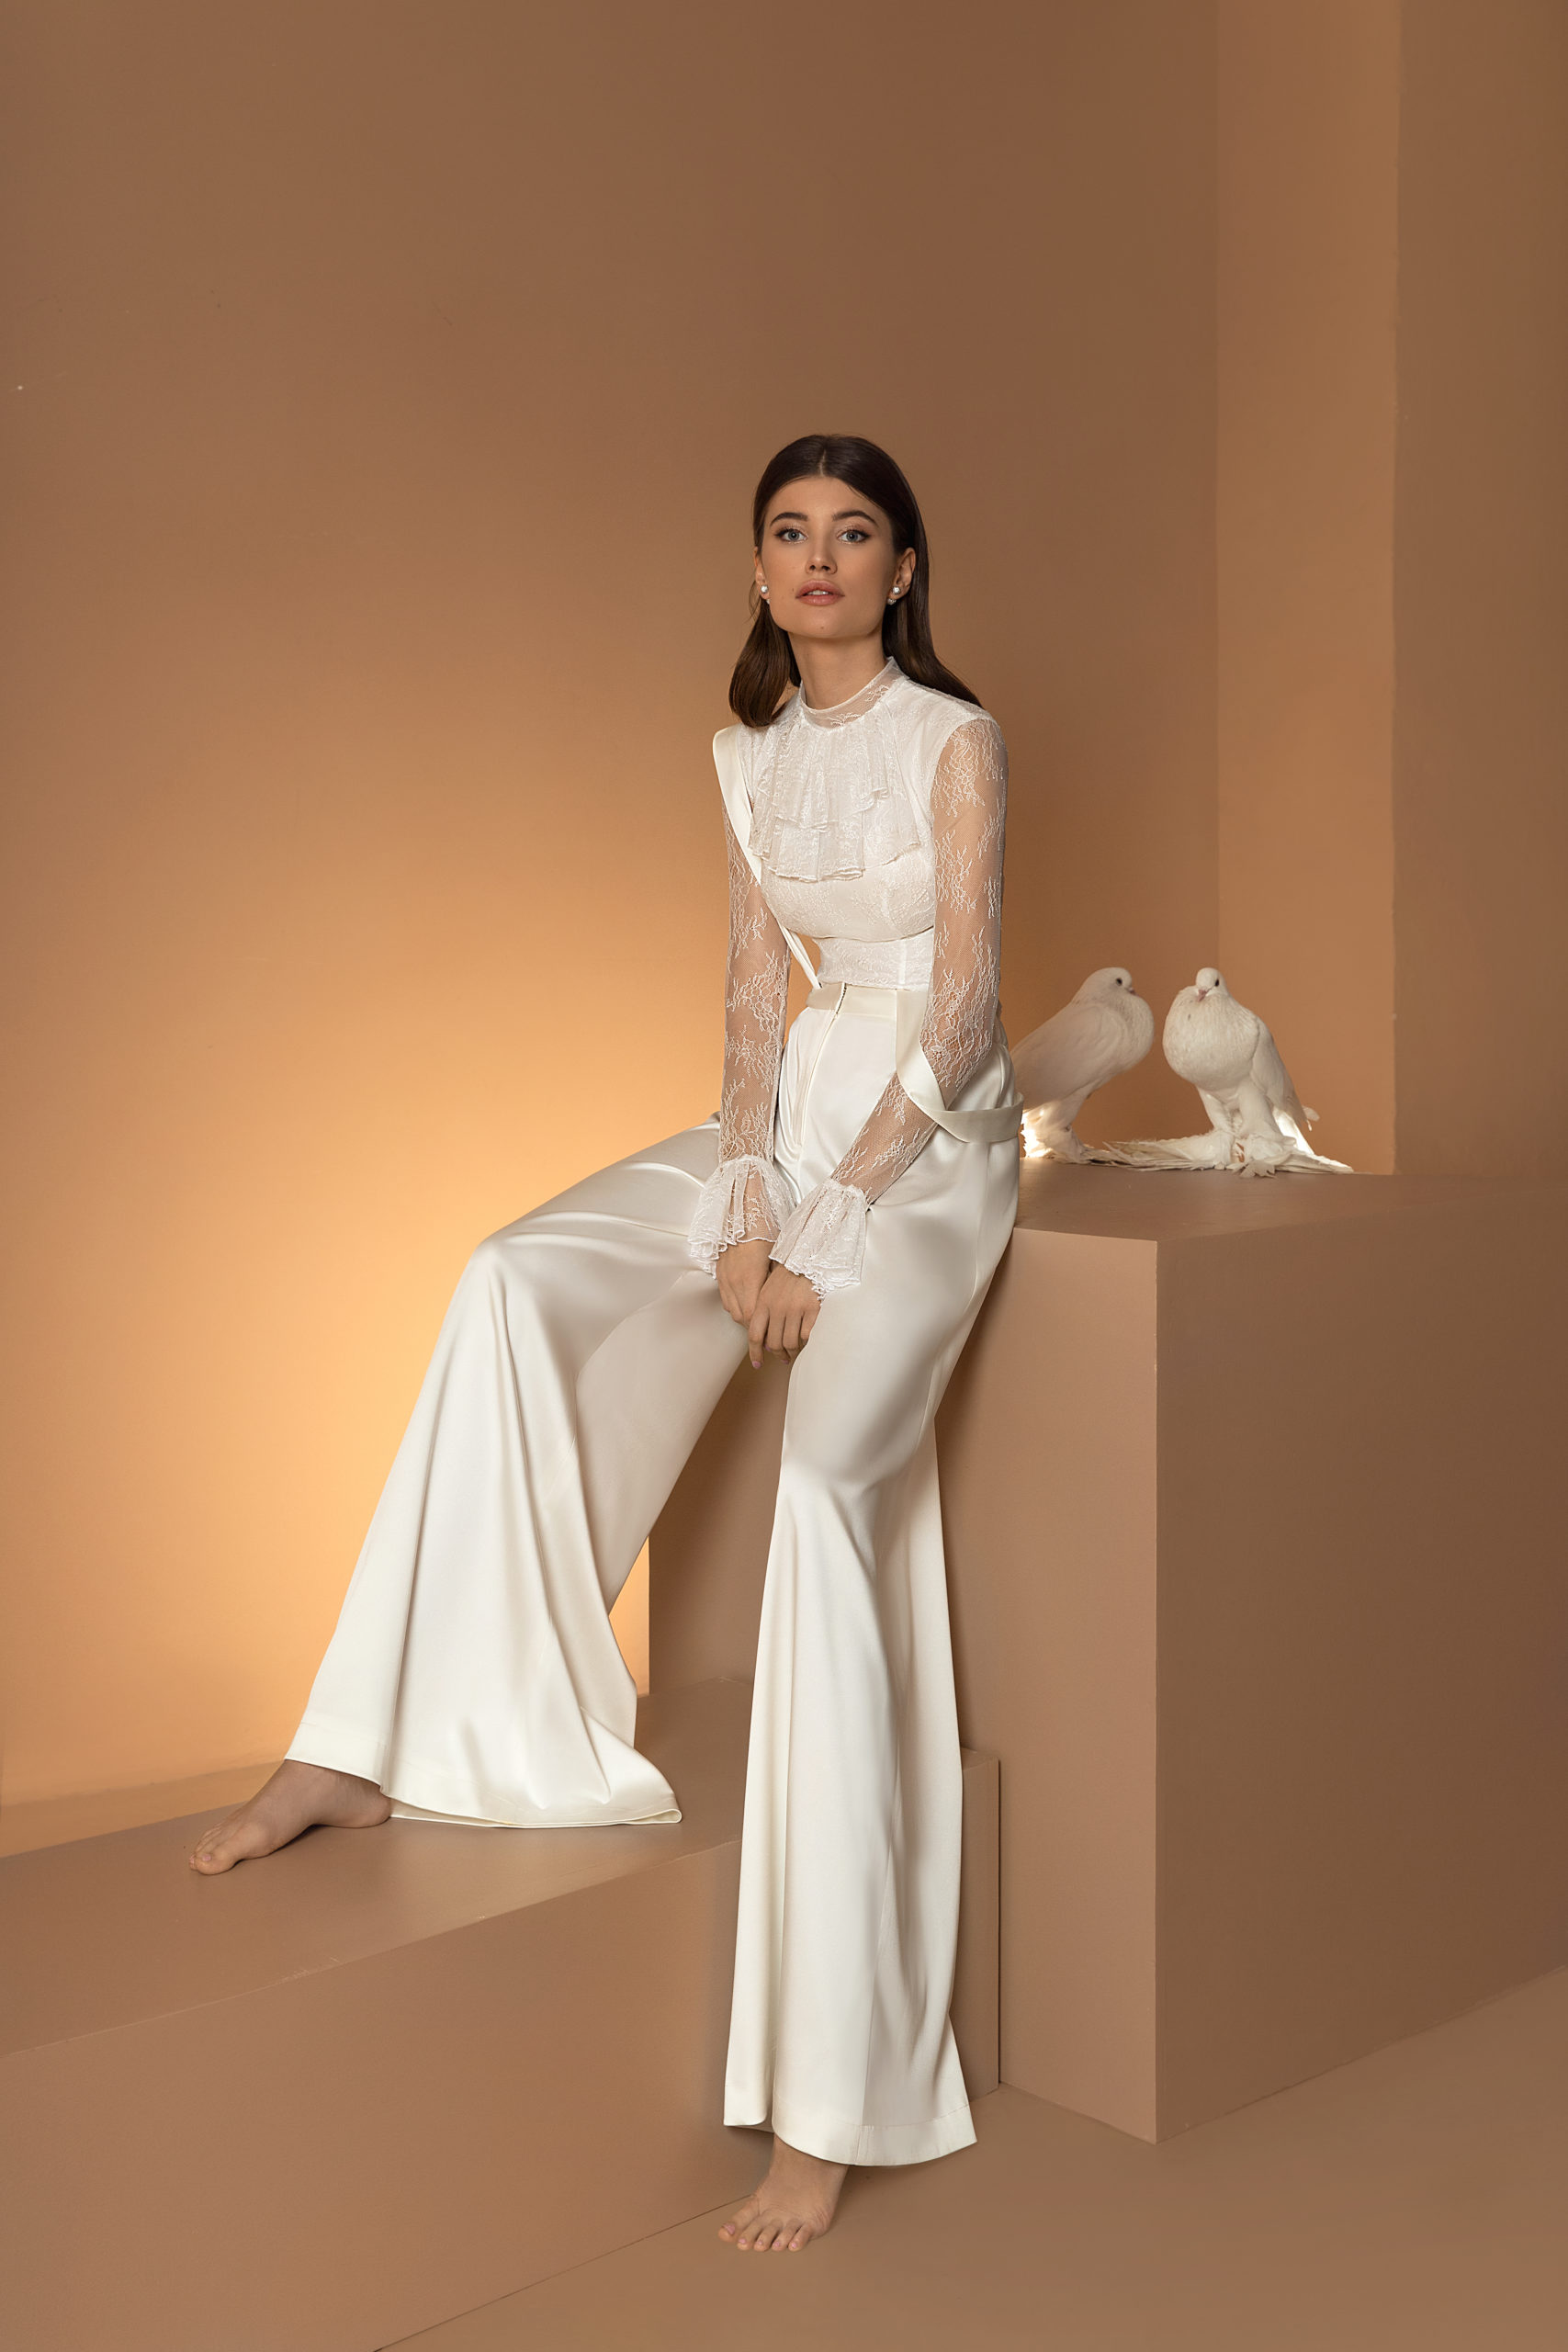 Robe de mariage ariamo combinaison pantalon body dentelle satin blanc civil